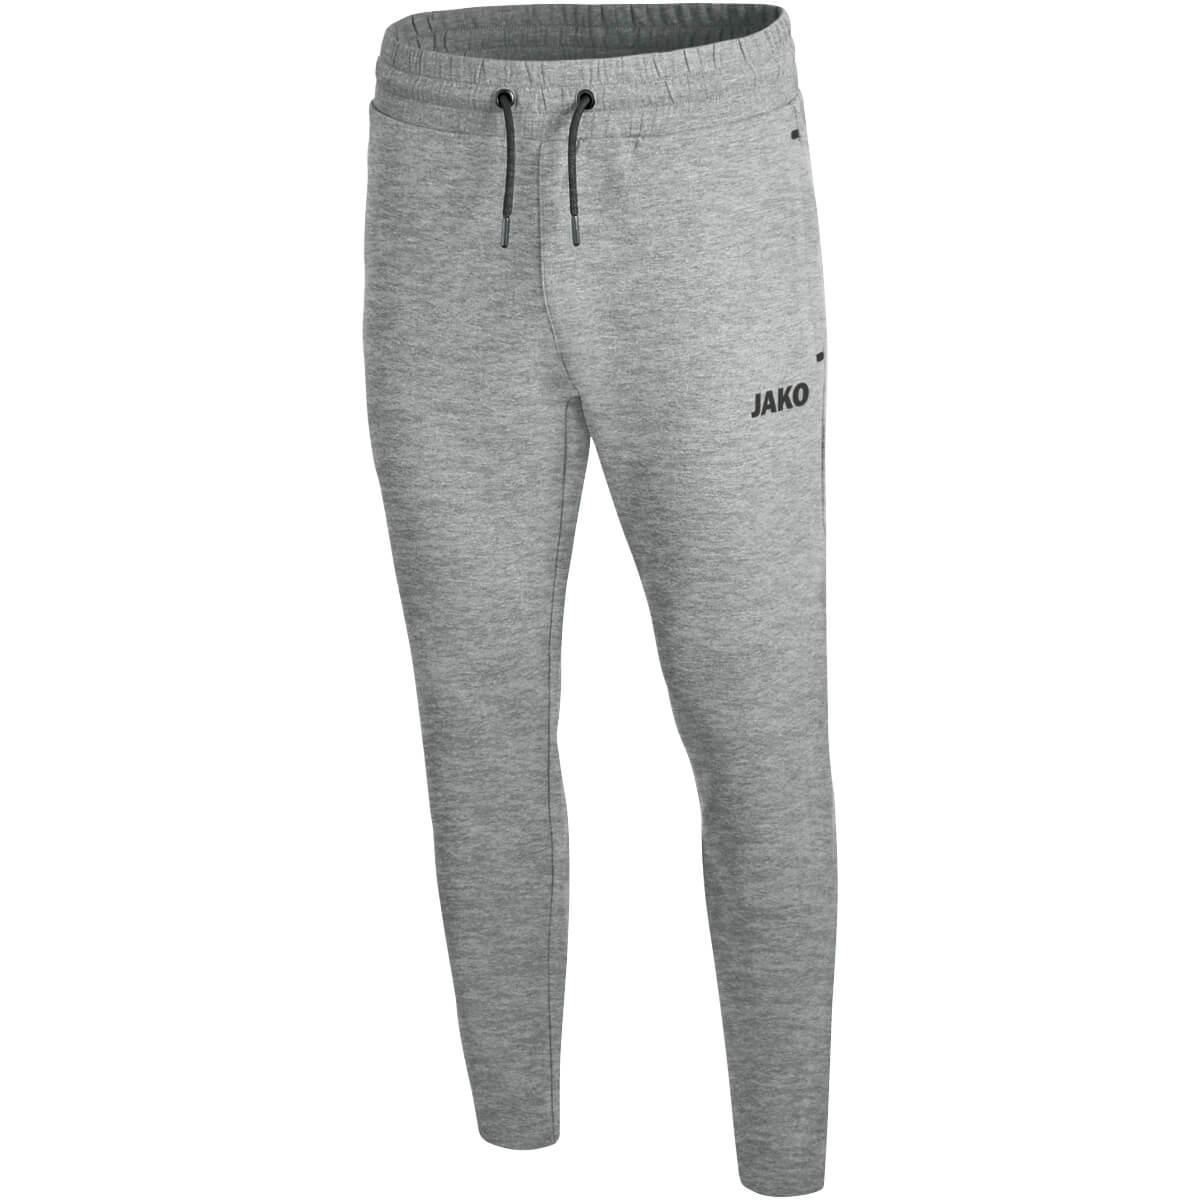 Jako Jogginghose Premium Basics Herren 8429  | div. Größen / Farben